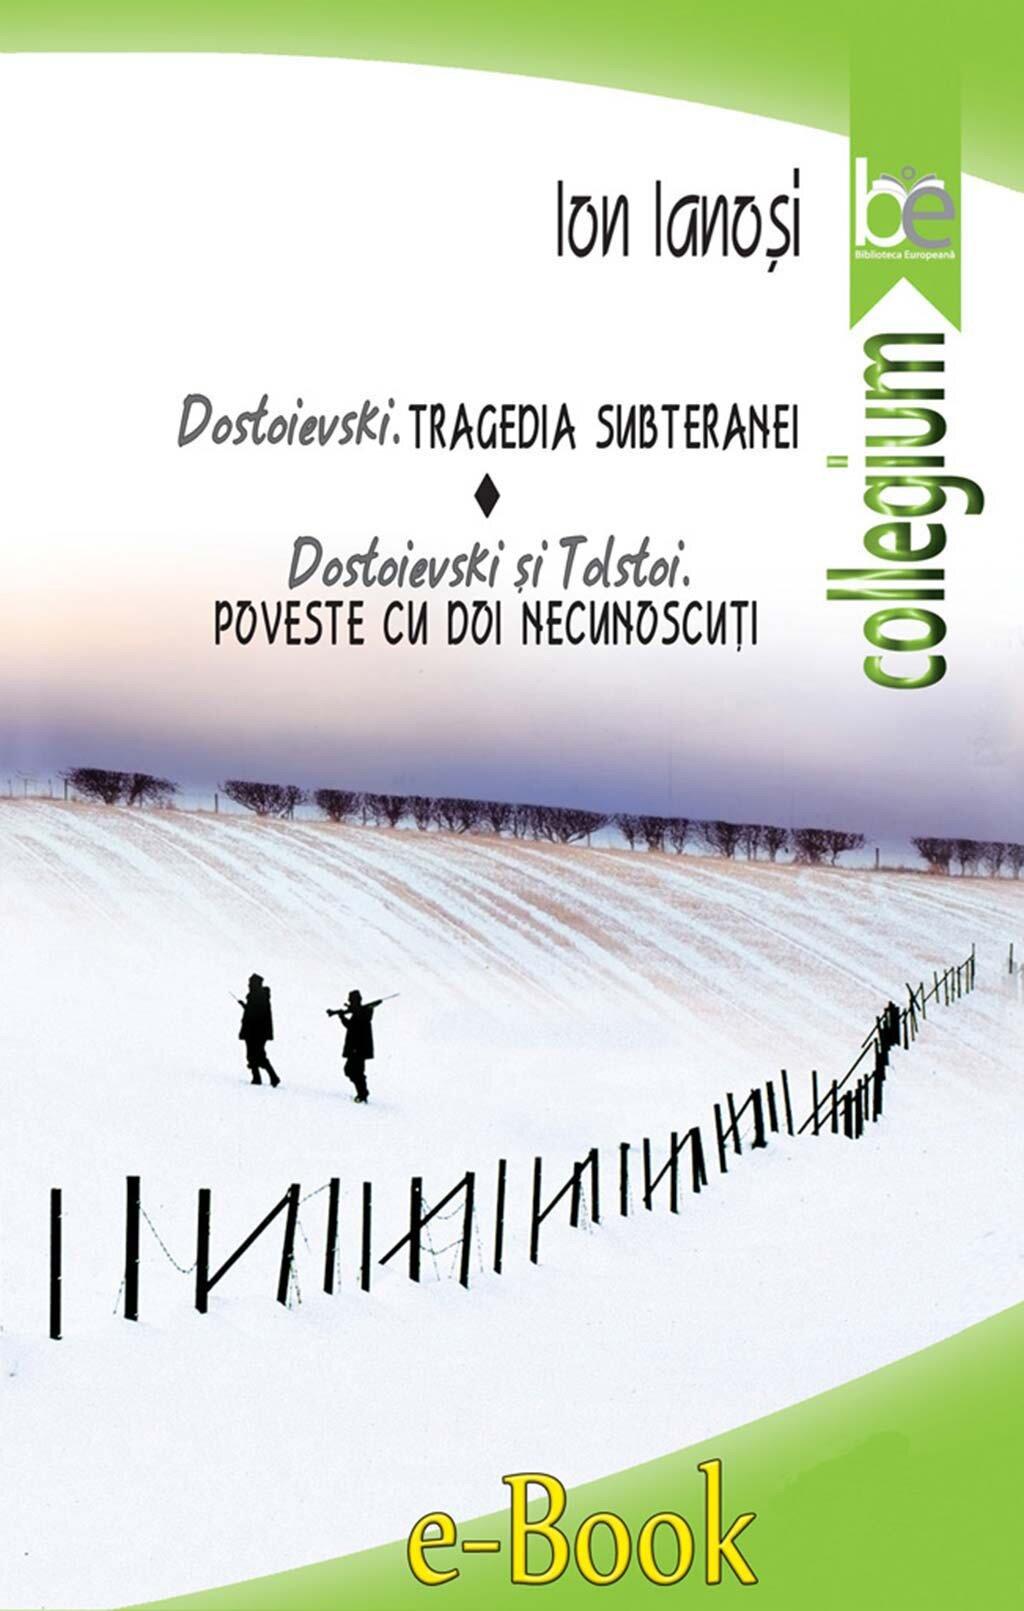 Dostoievski. Tragedia subteranei. Dostoievski si Tolstoi. Poveste cu doi necunoscuti (eBook)